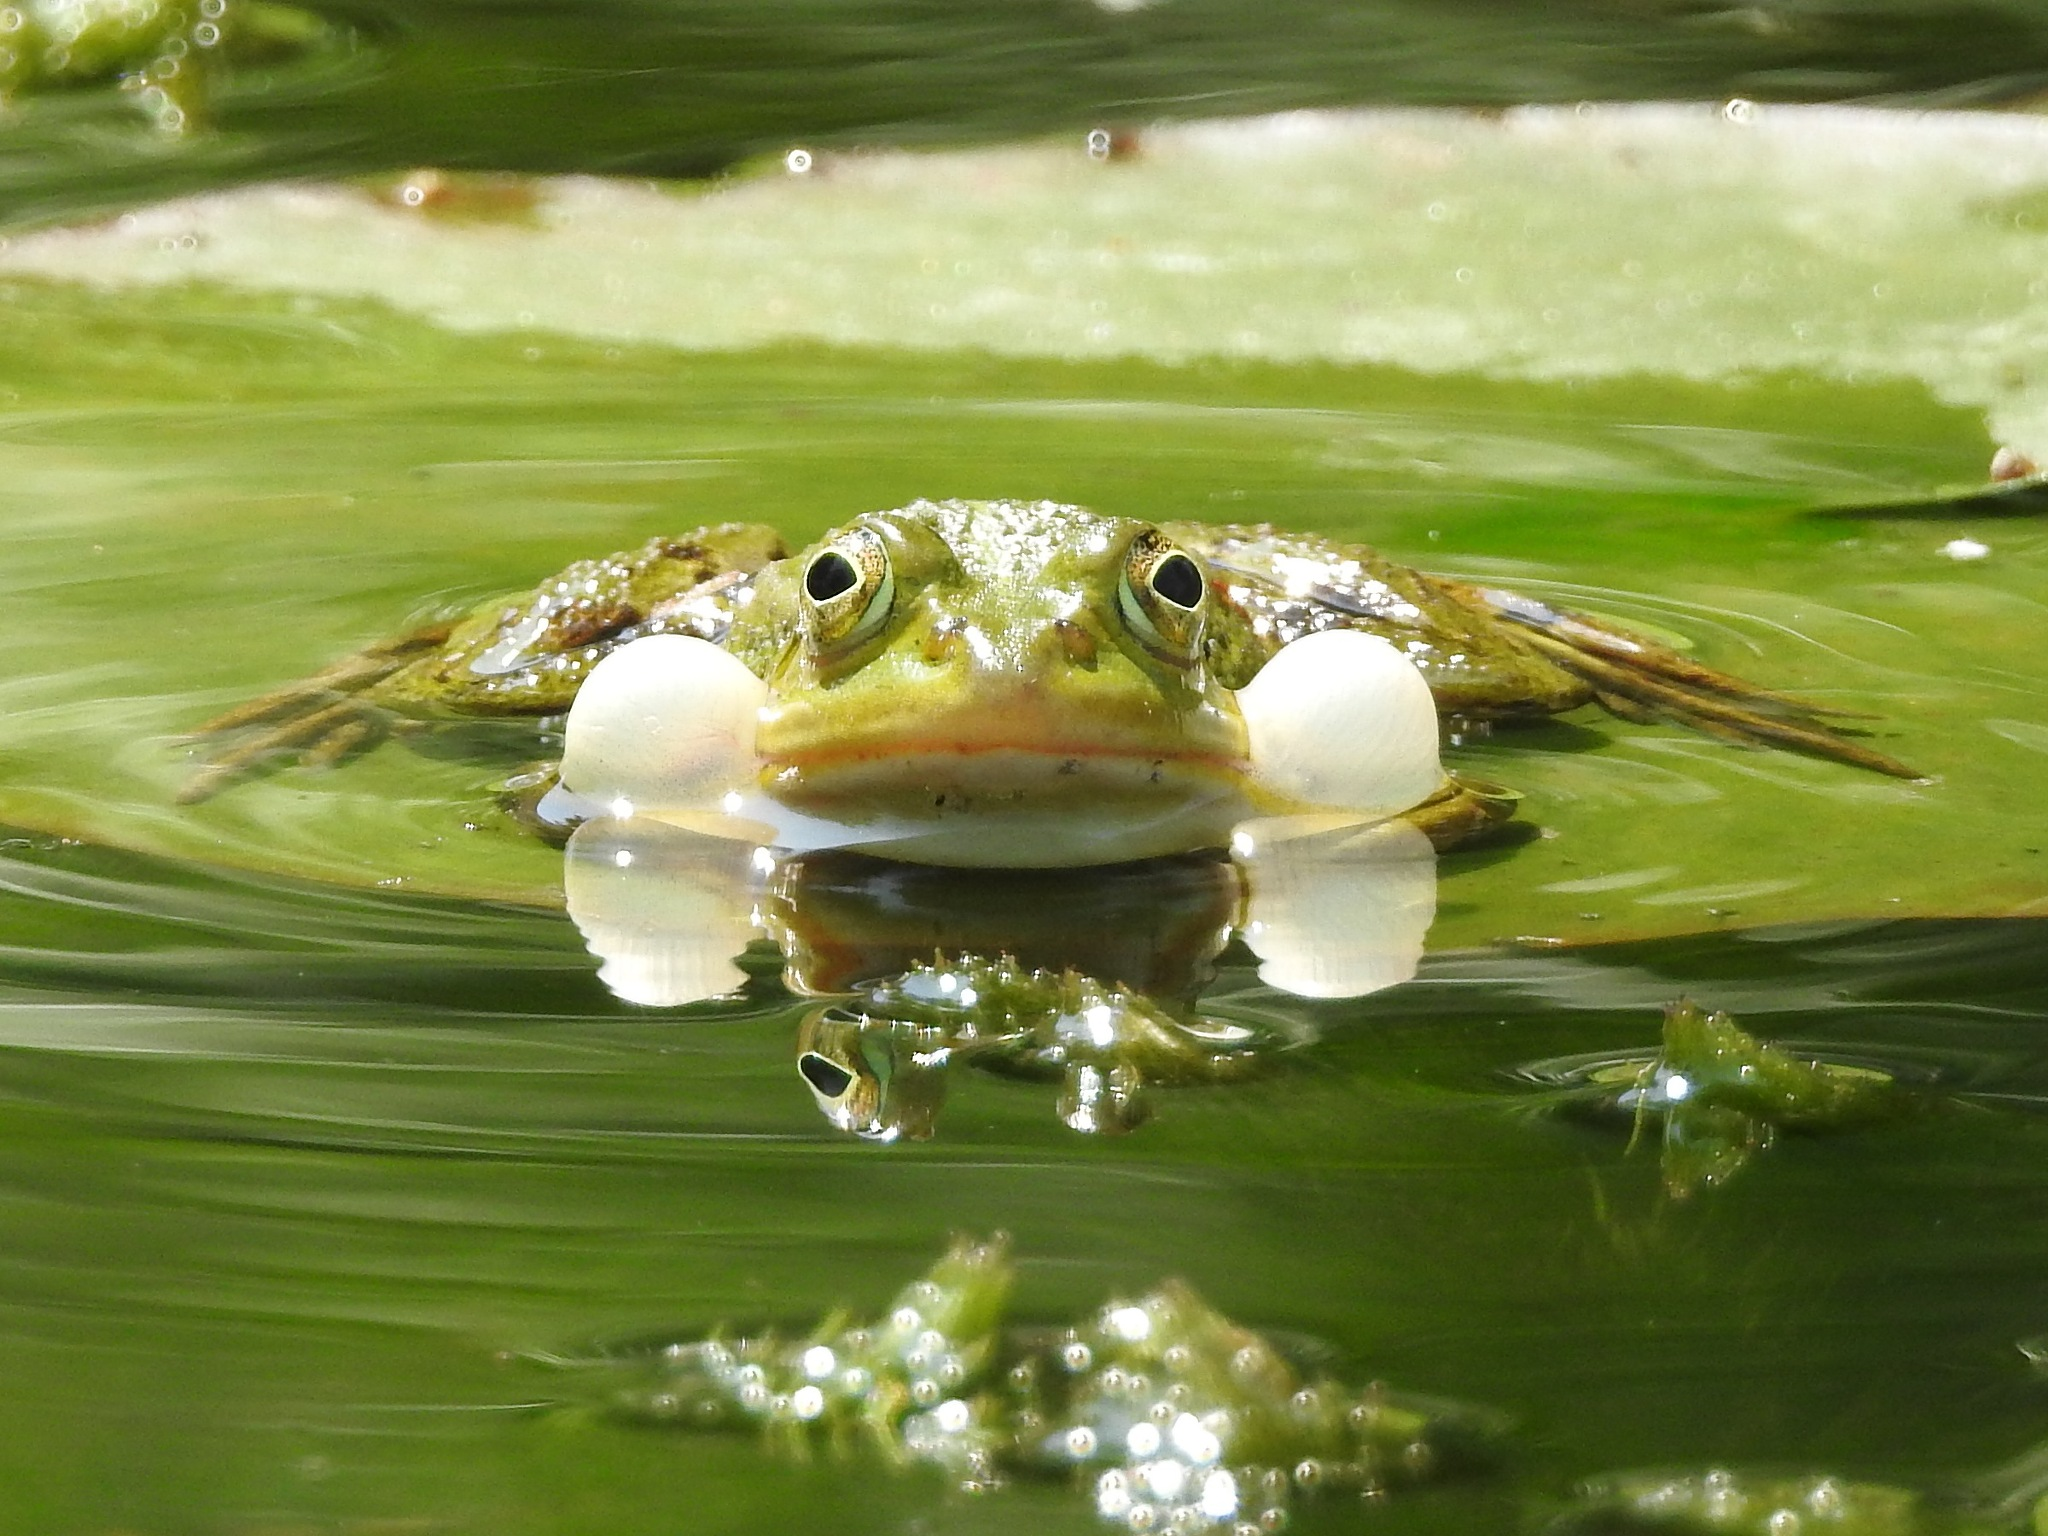 Freaking frog by Fedor de Vries